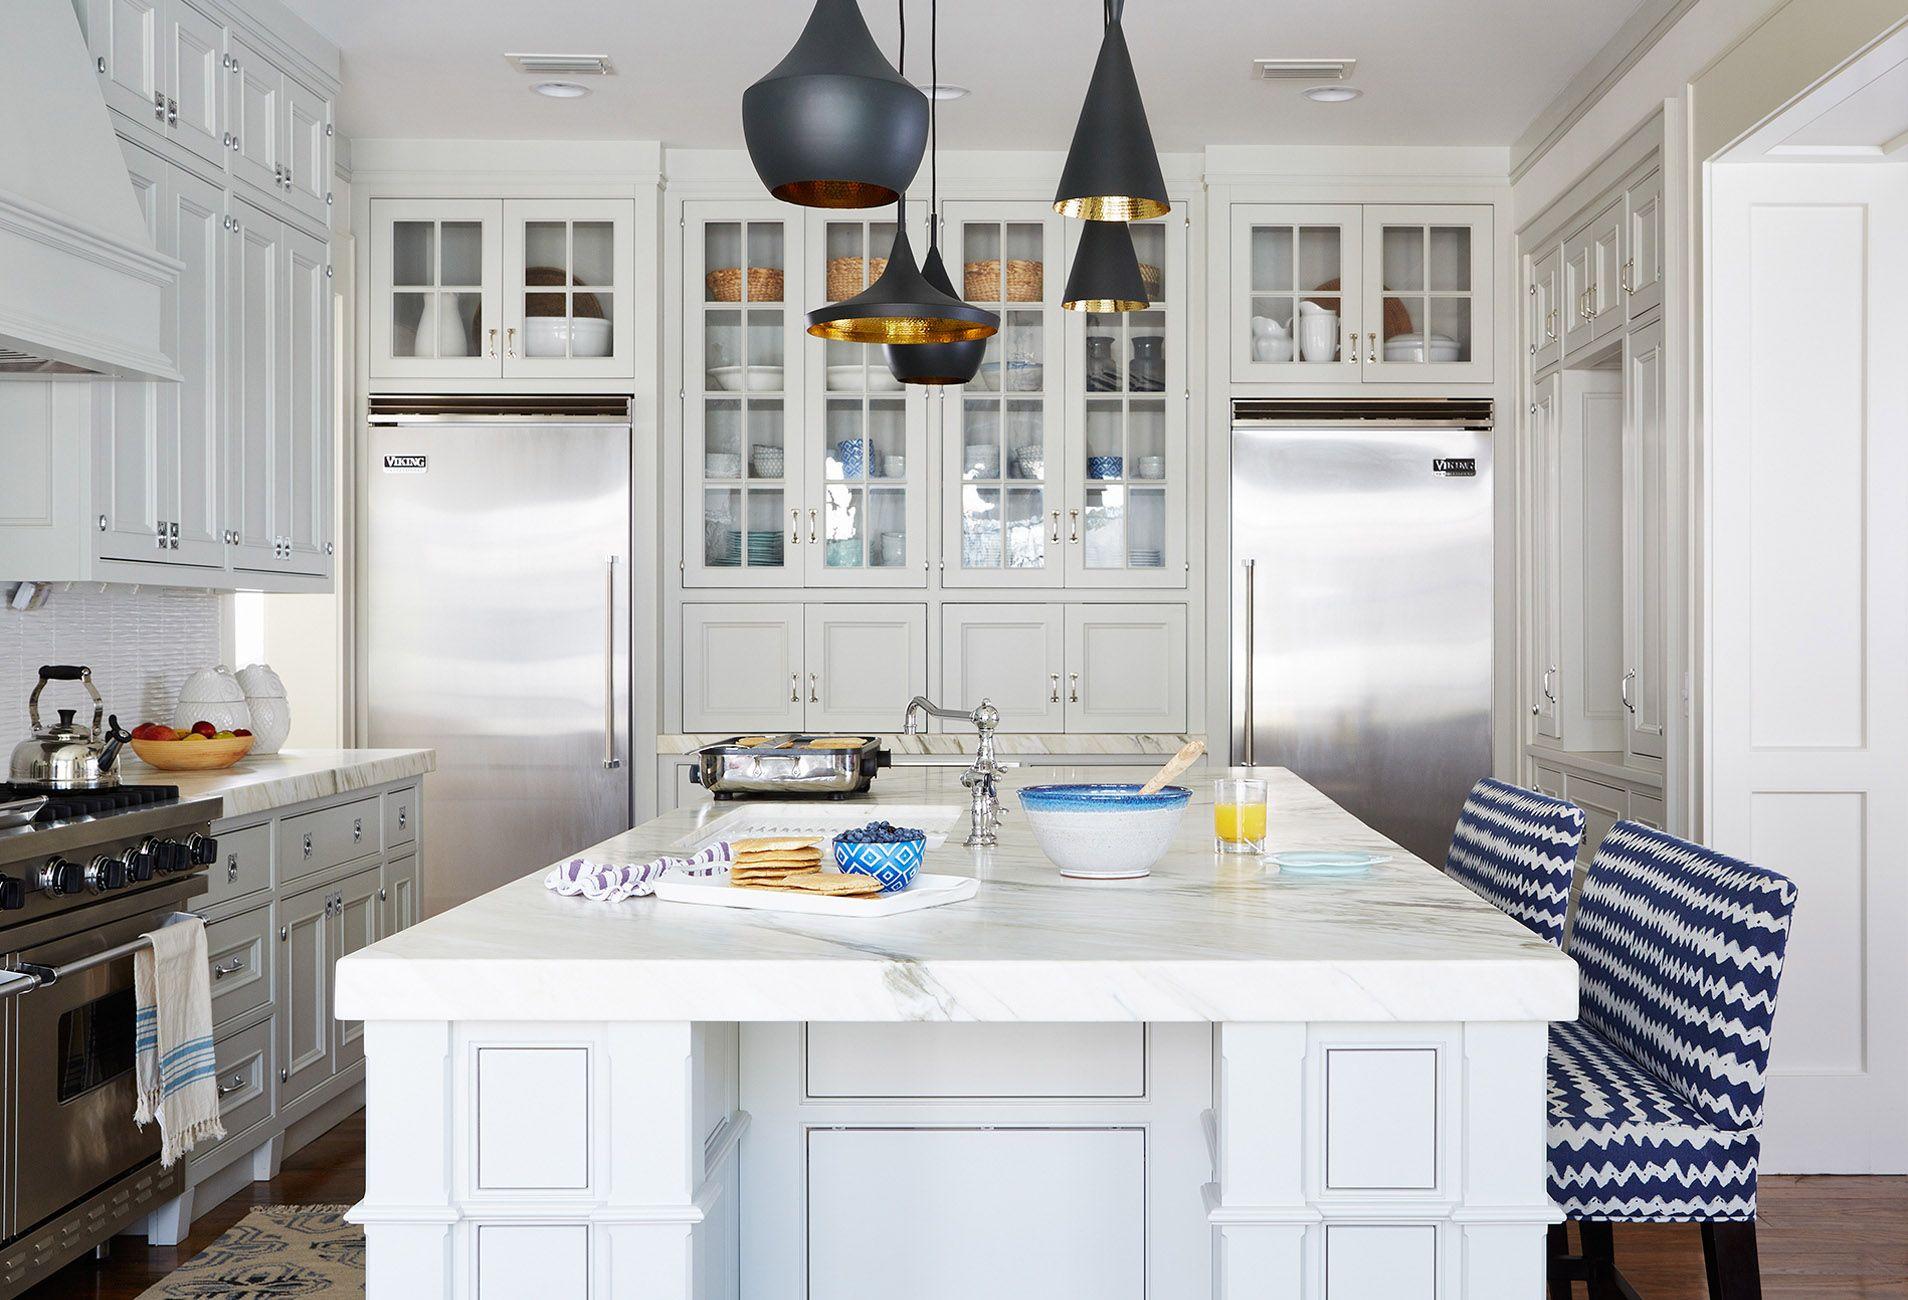 Andrew Howard Interior Design Lemon Street Kitchen Design Home Kitchen Remodel